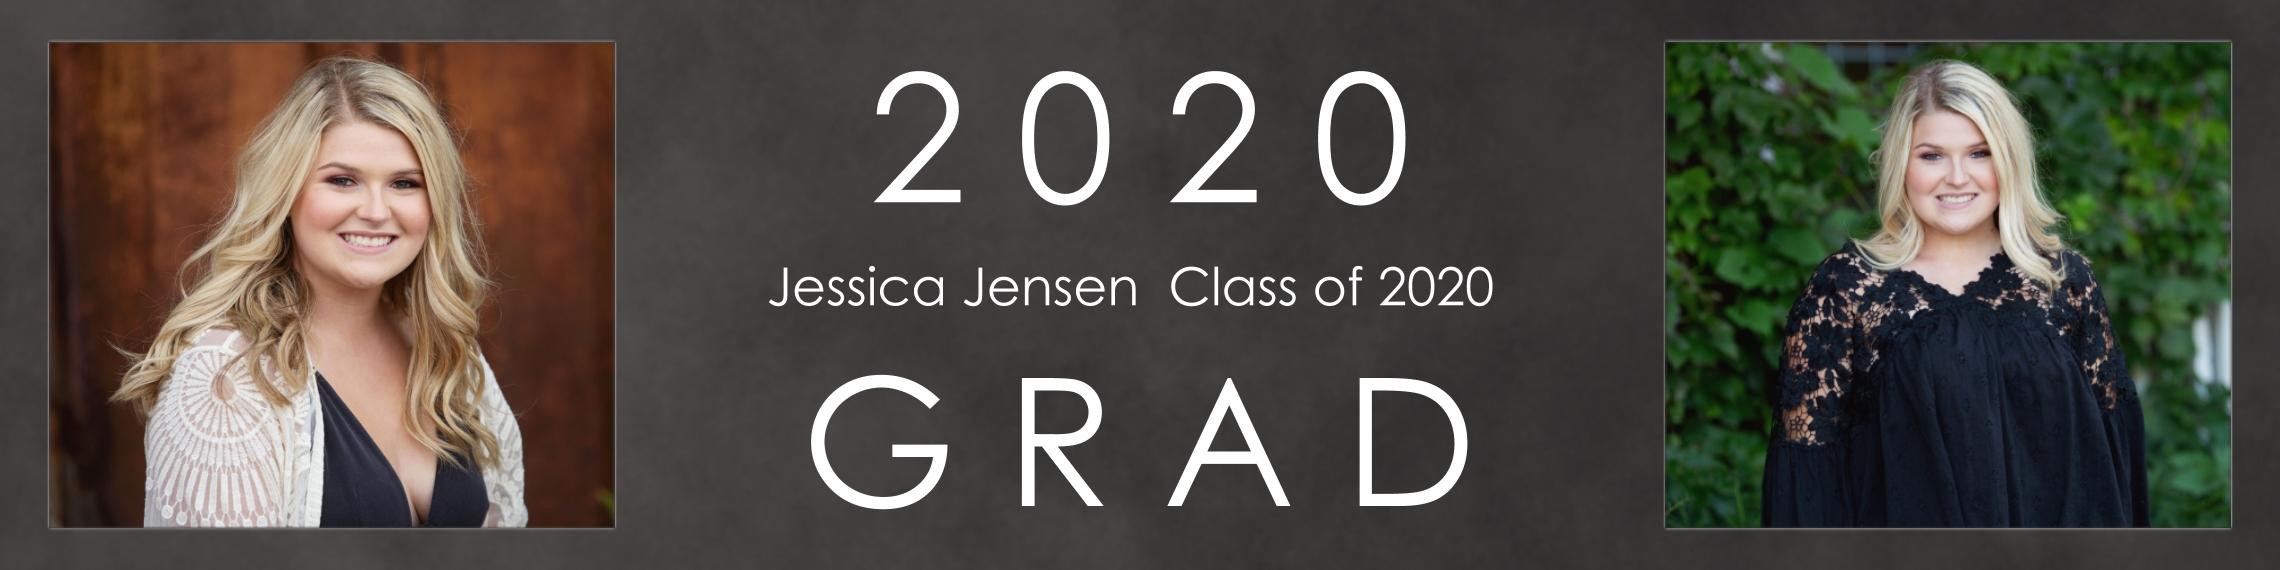 Graduation Vinyl Banner, 2x8, Home Décor -Modern Grad